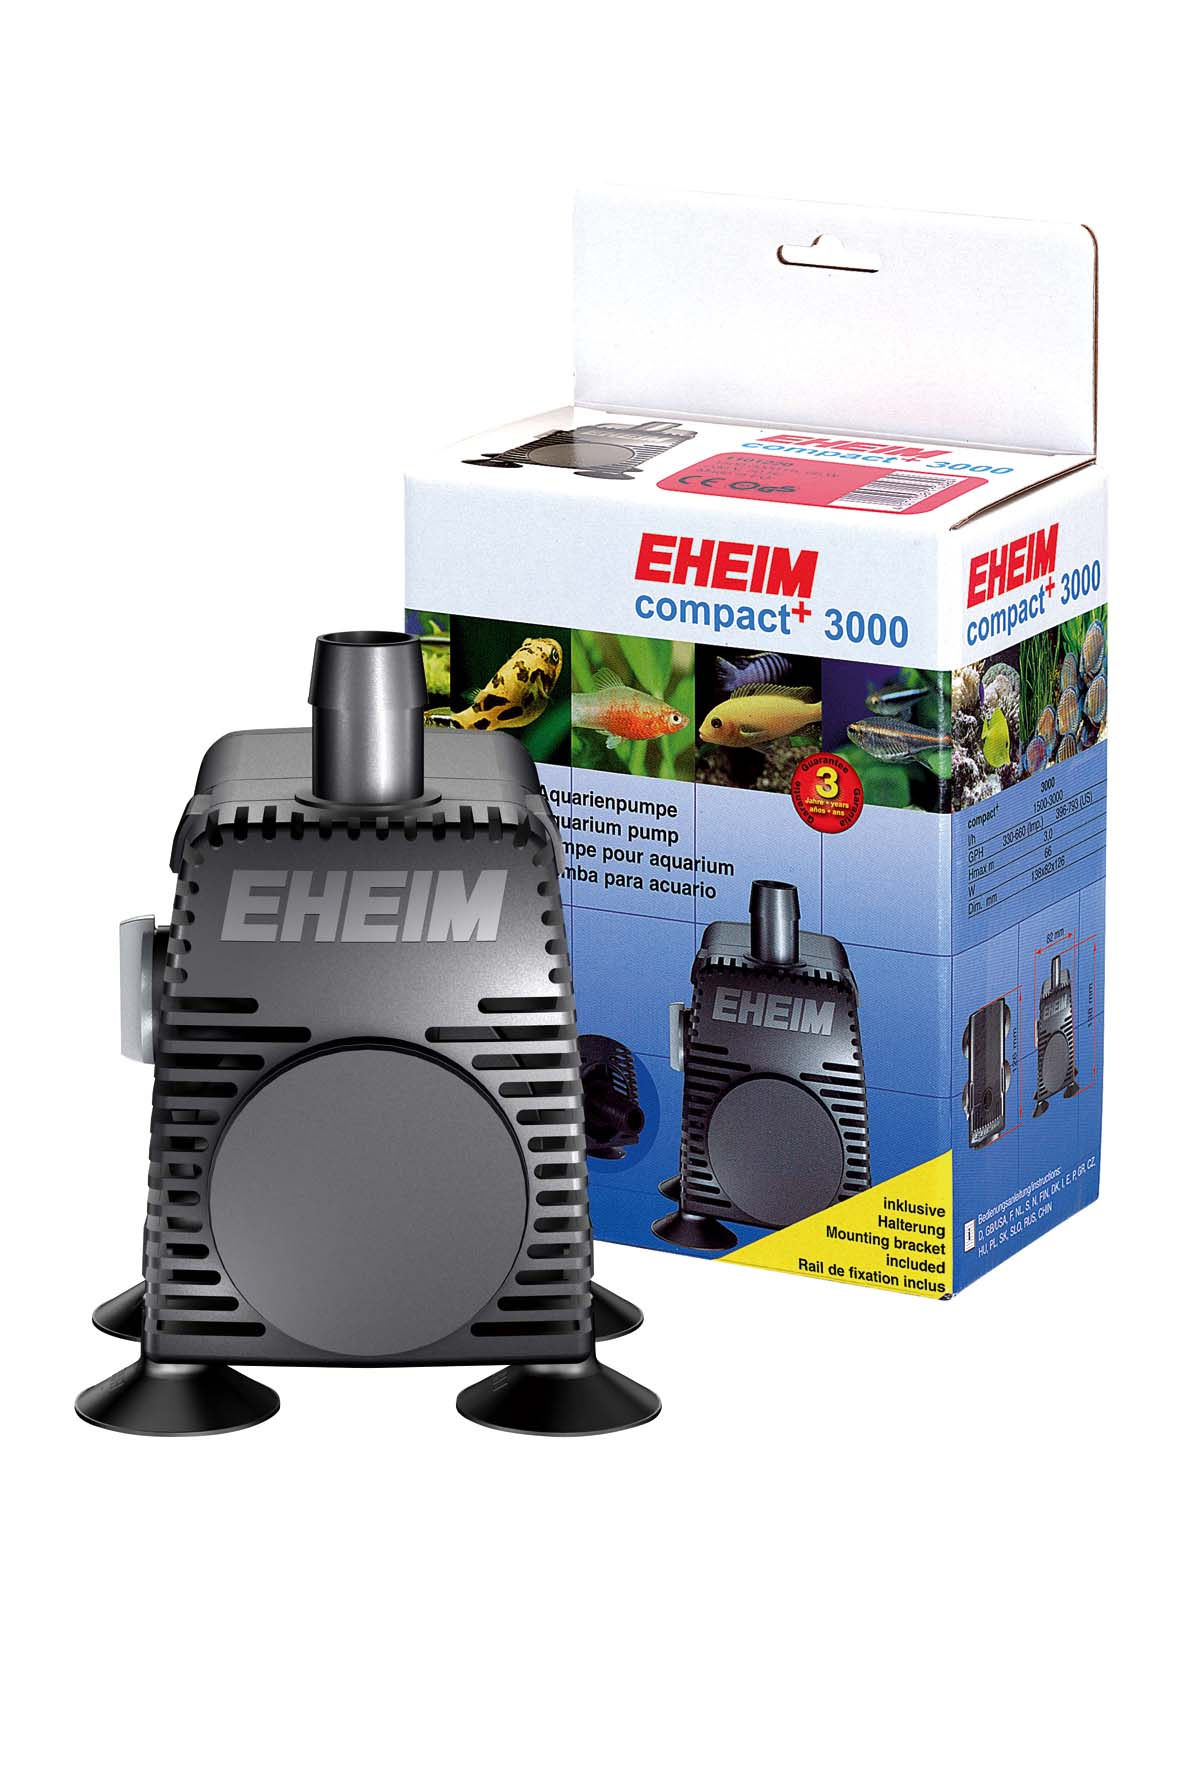 EHEIM Pumpe compact+